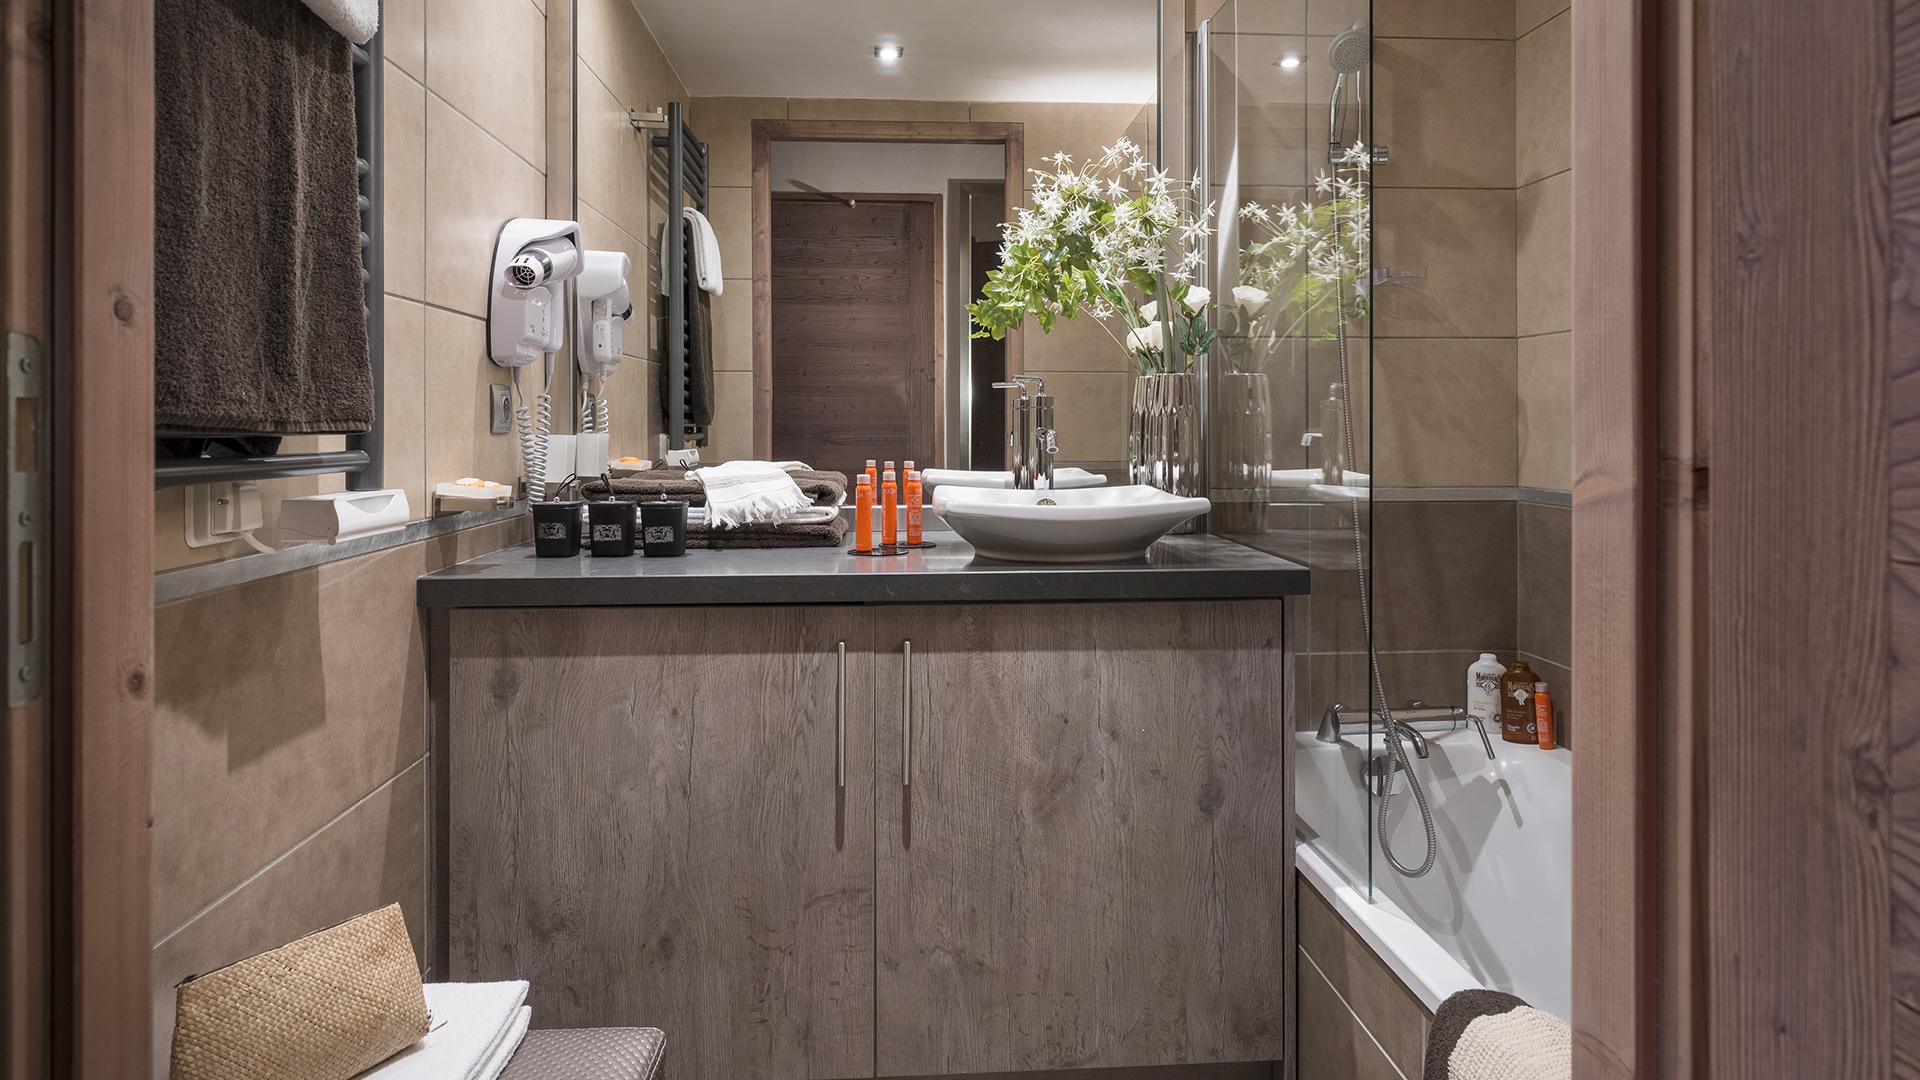 Salle de bain, Le Centaure - CGH Résidences